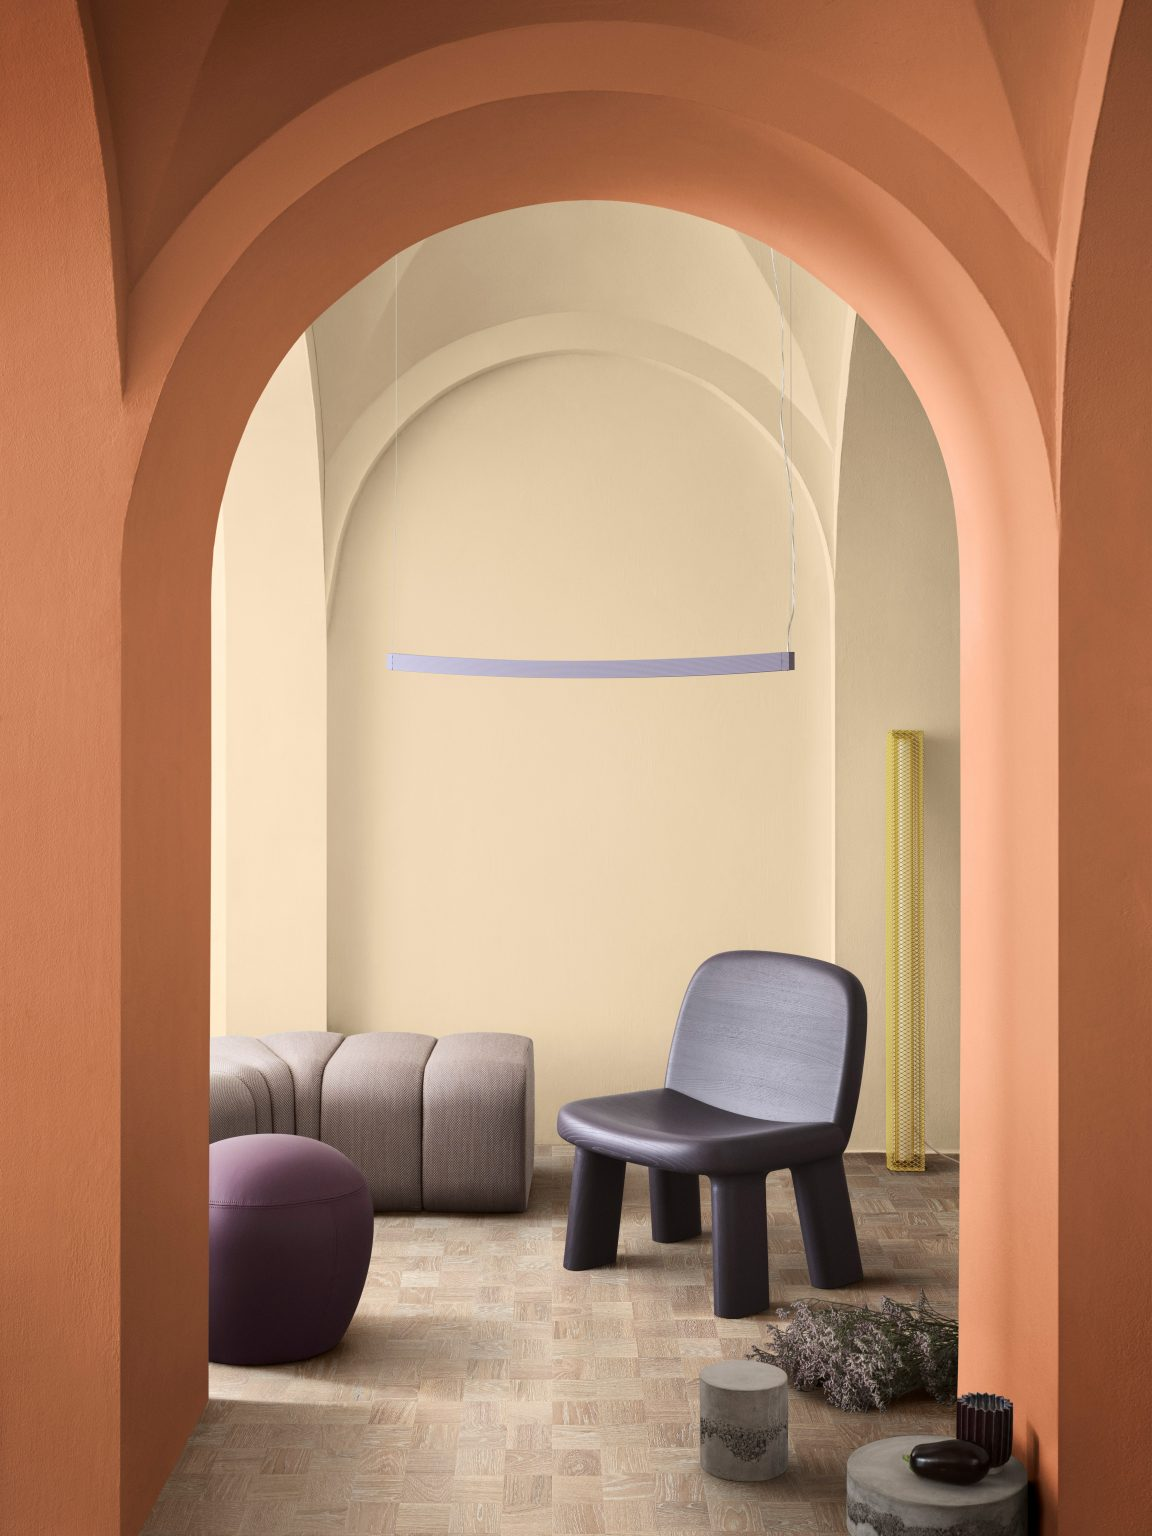 Biennale Interieur - Belgium's leading design and interior event - Maximus-project-2-new.jpg